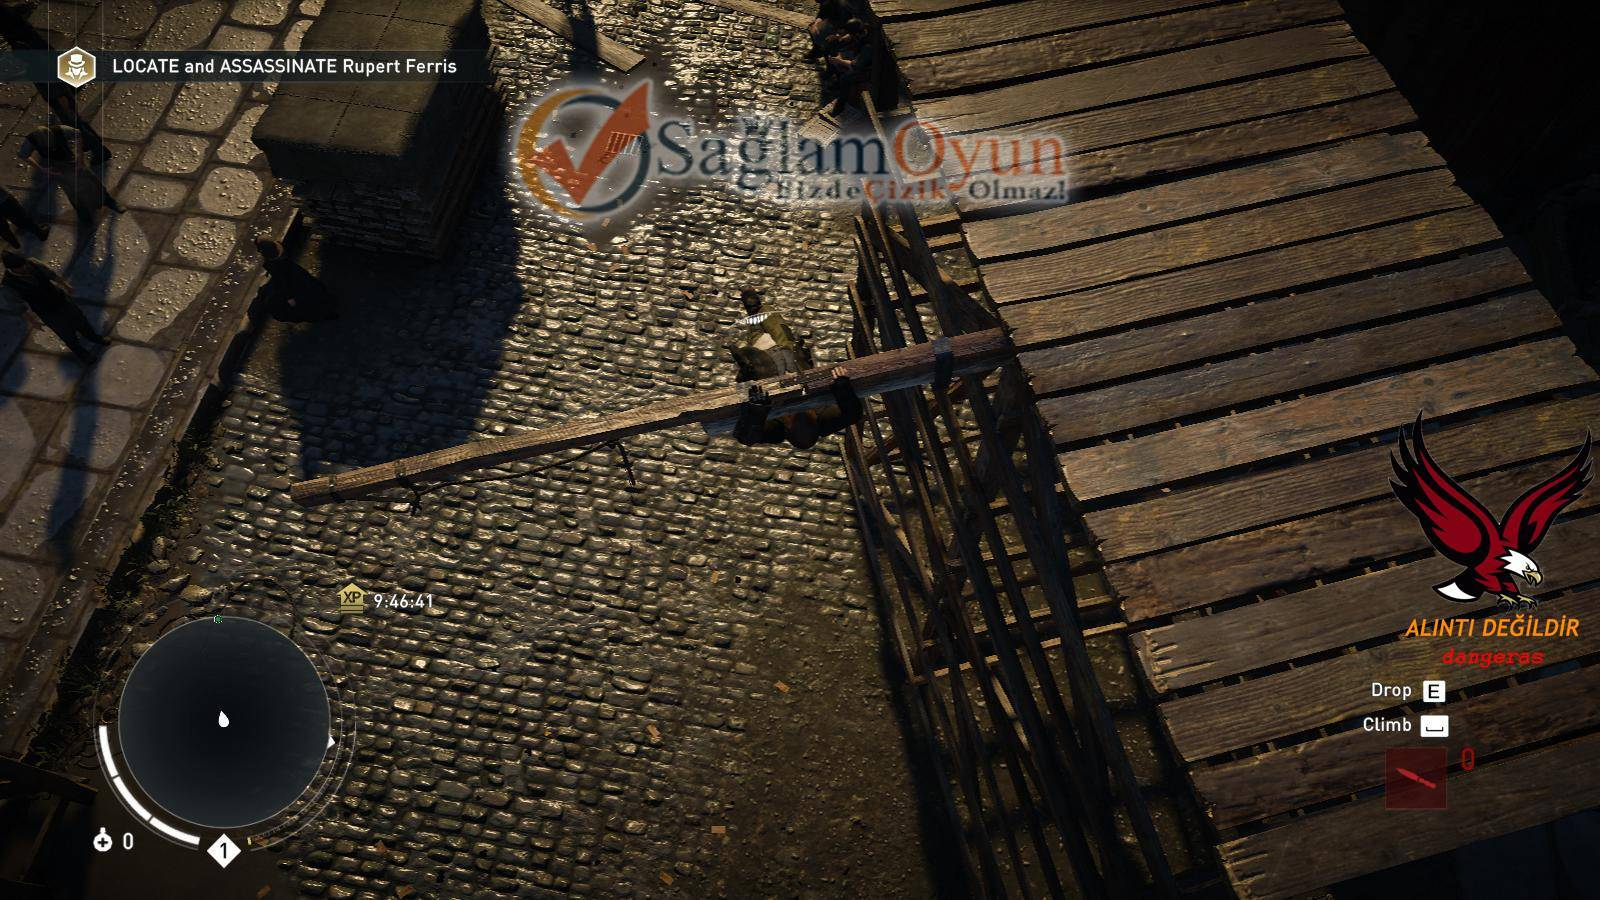 assassins-creed-syndicate-full-tek-link-indir-torrent